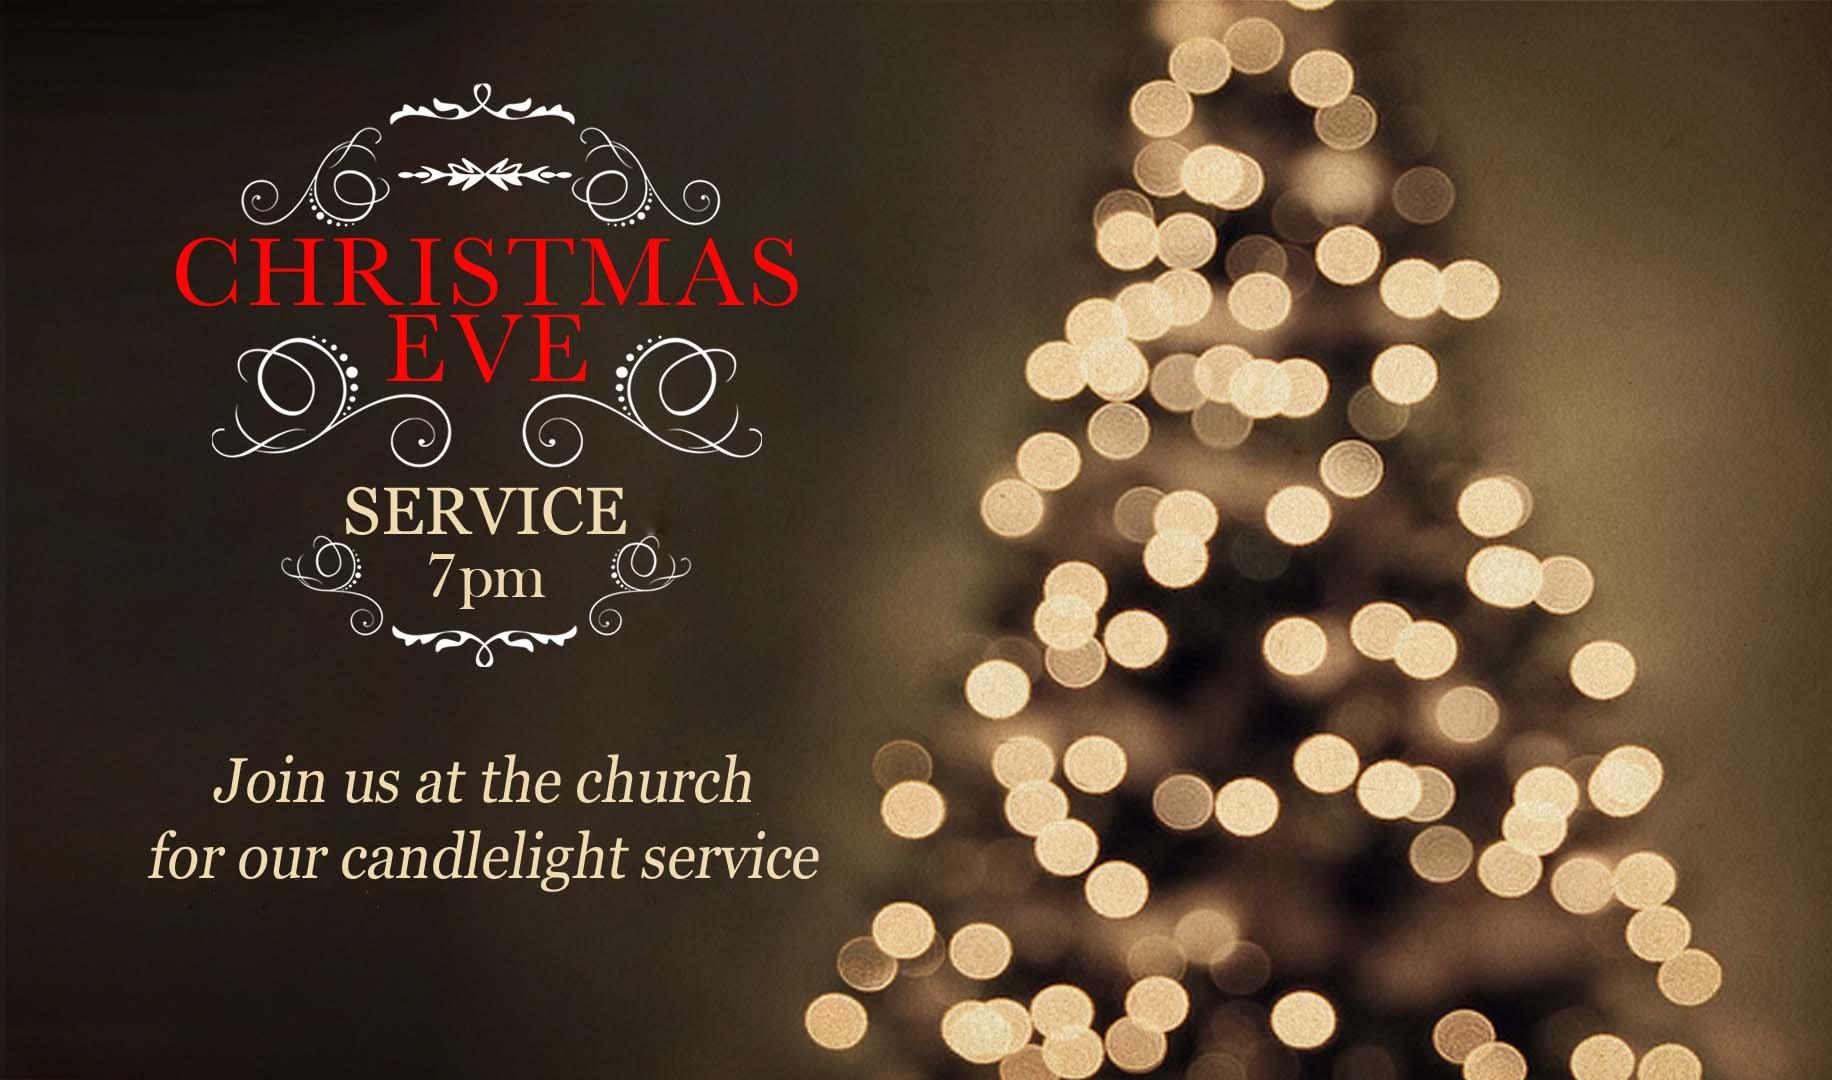 images/christmaseveservice.jpg